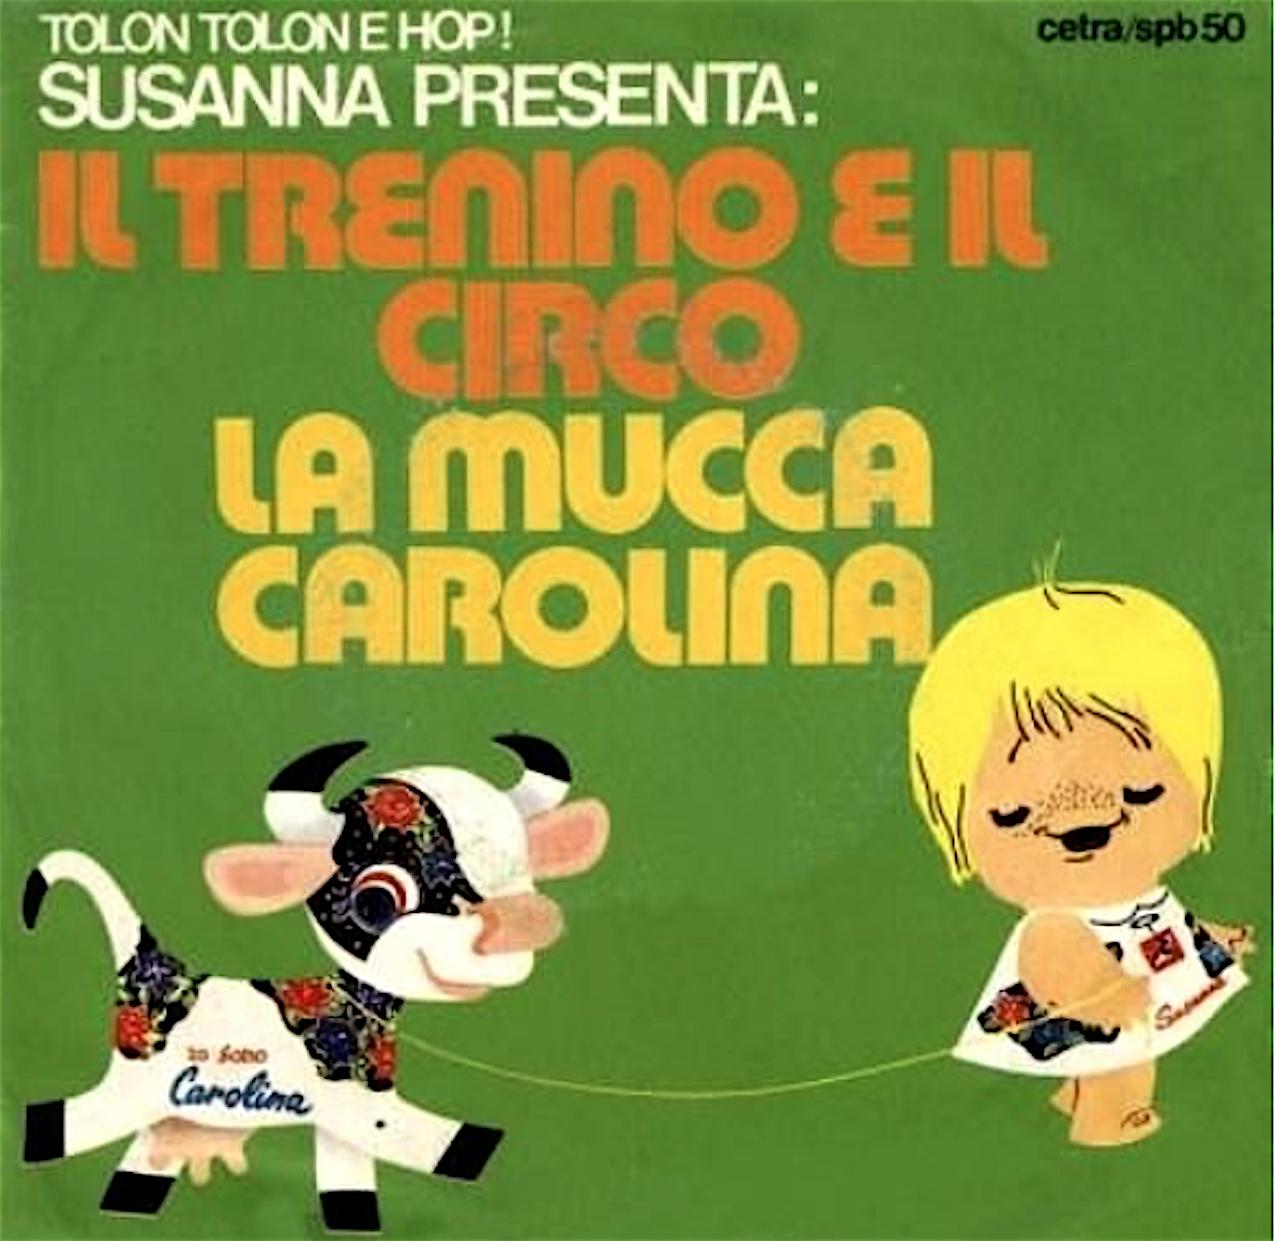 susanna_tutta_panna_carosello_invernizzina_mucca_carolina